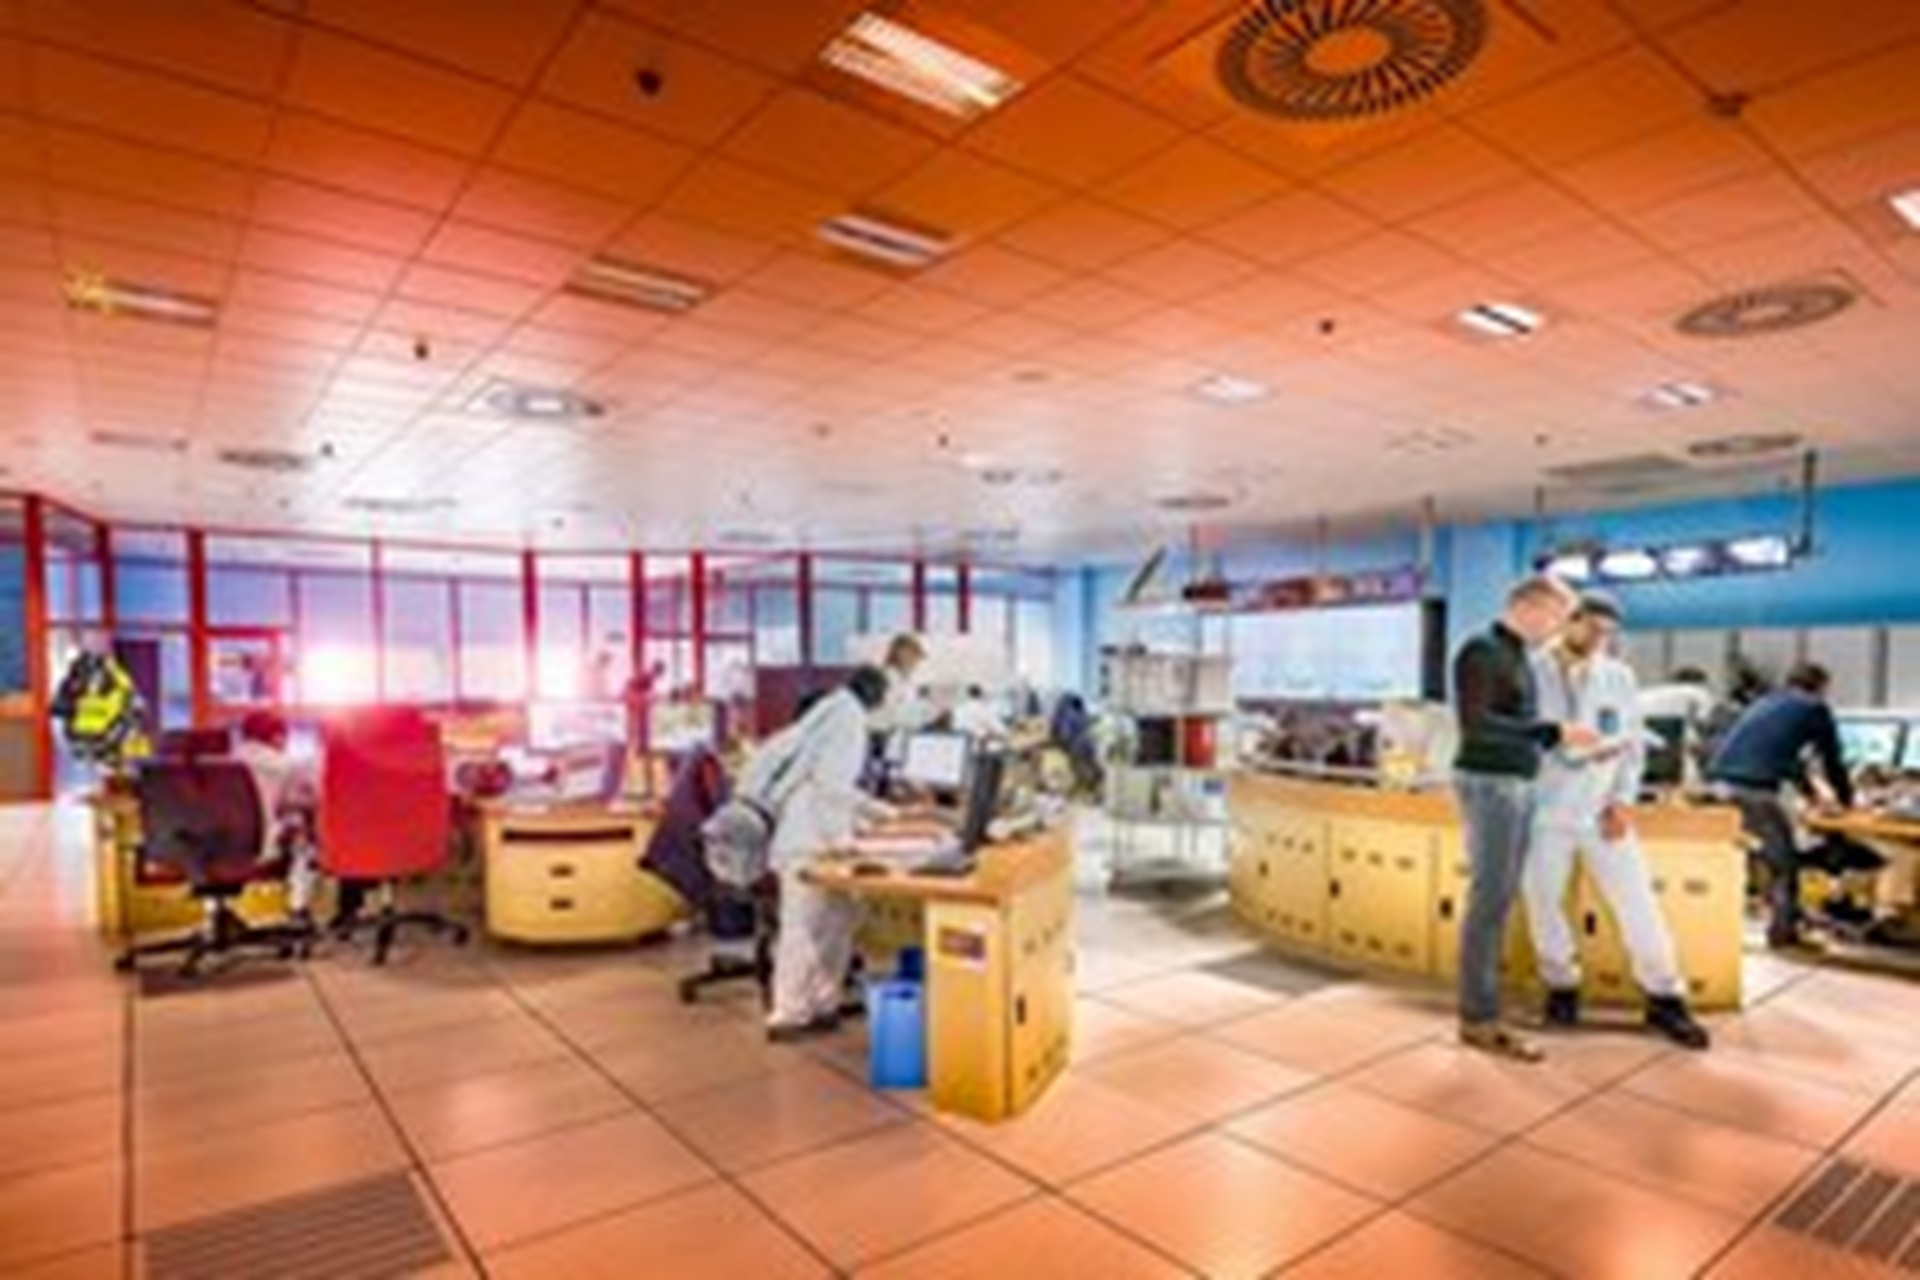 Salle de conduite de l'usine d'enrichissement Georges Besse II Nord (GB II), Tricastin